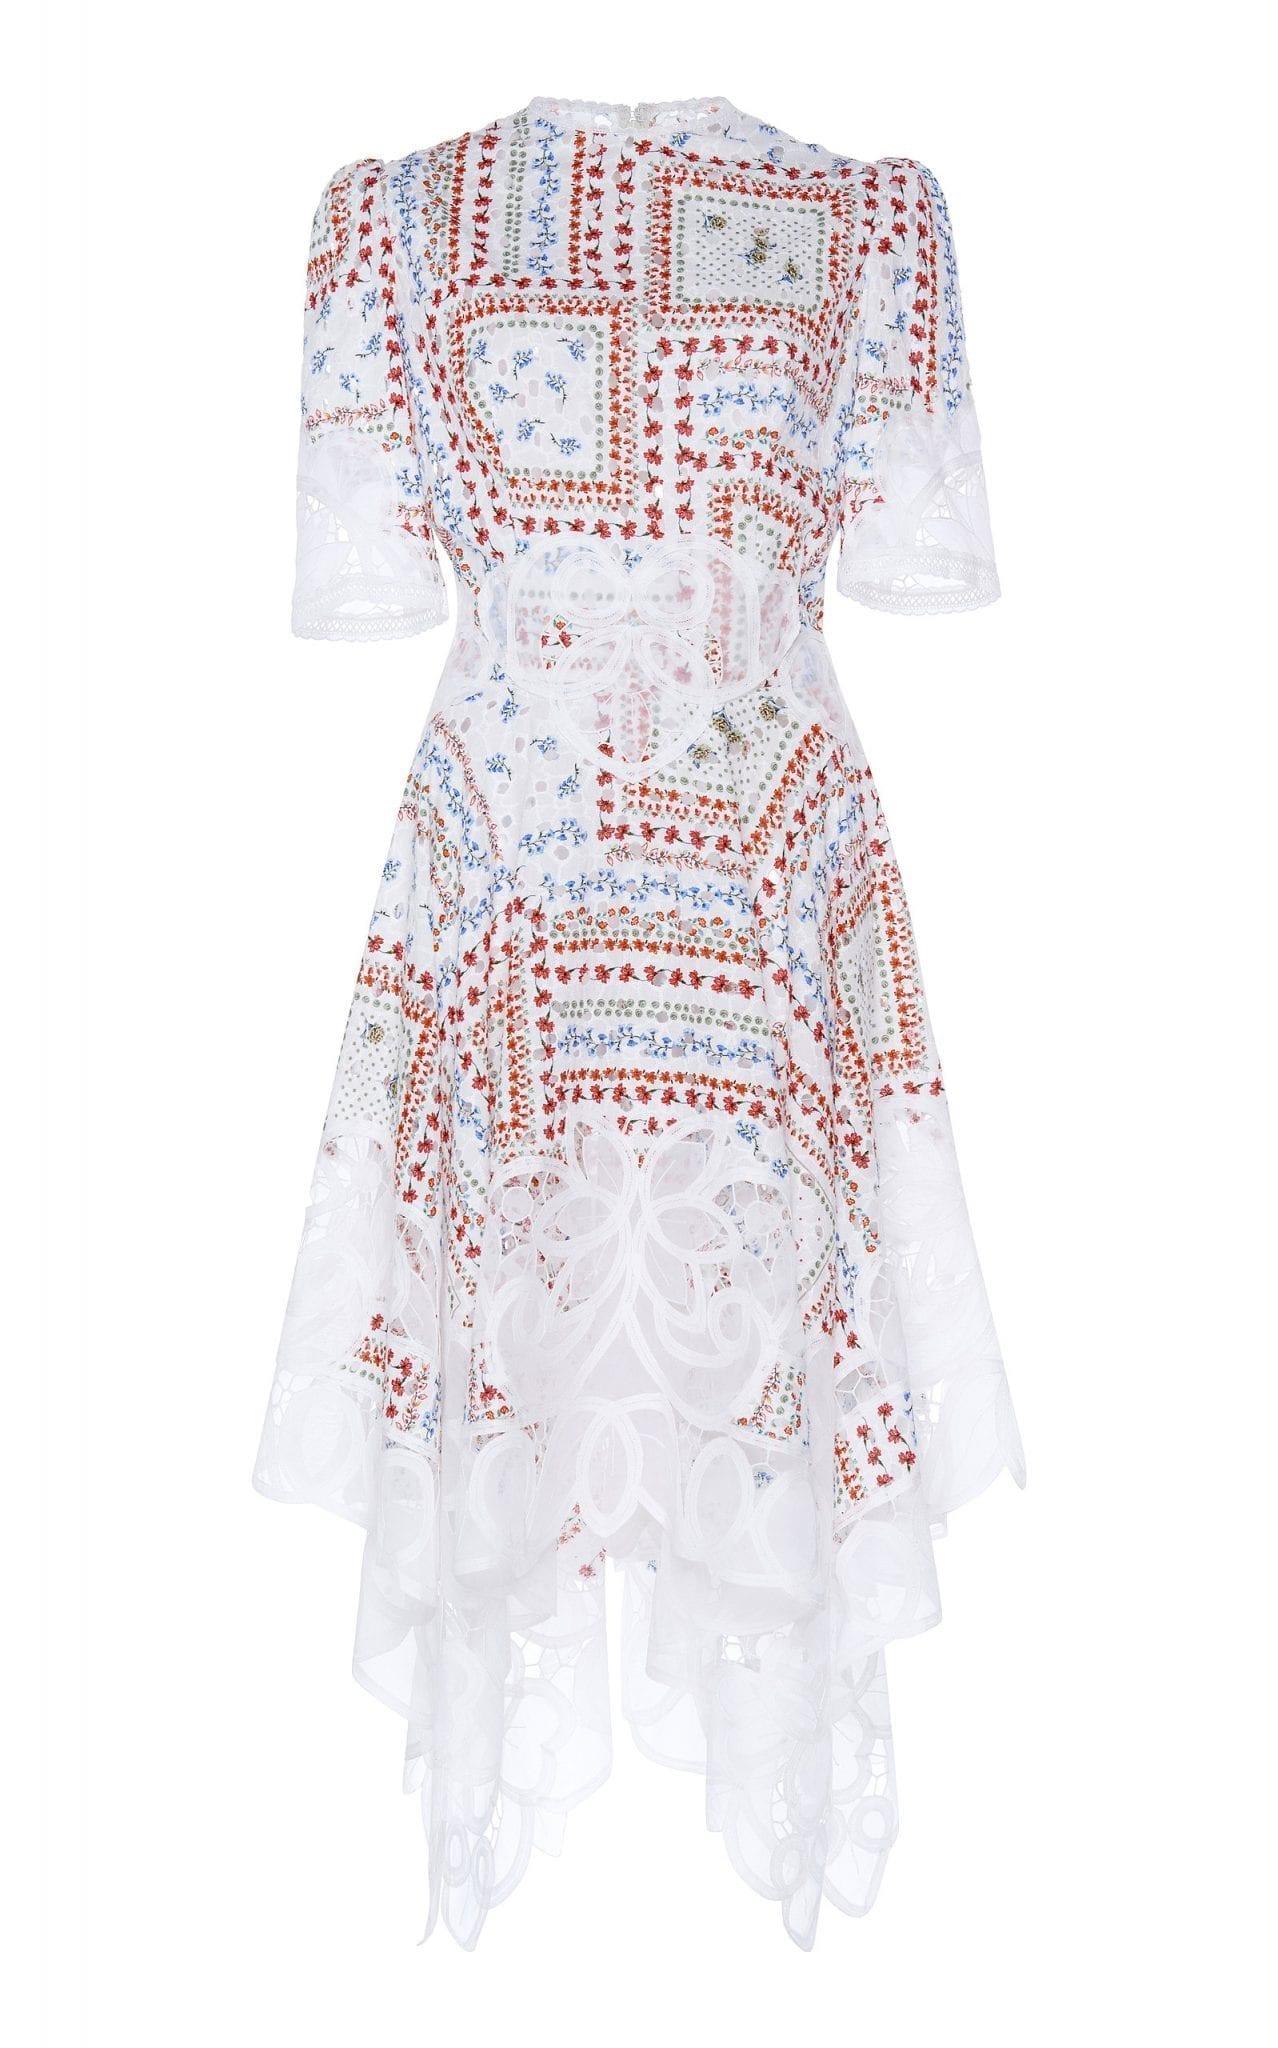 COSTARELLOS Printed Cotton Handkerchief Dress